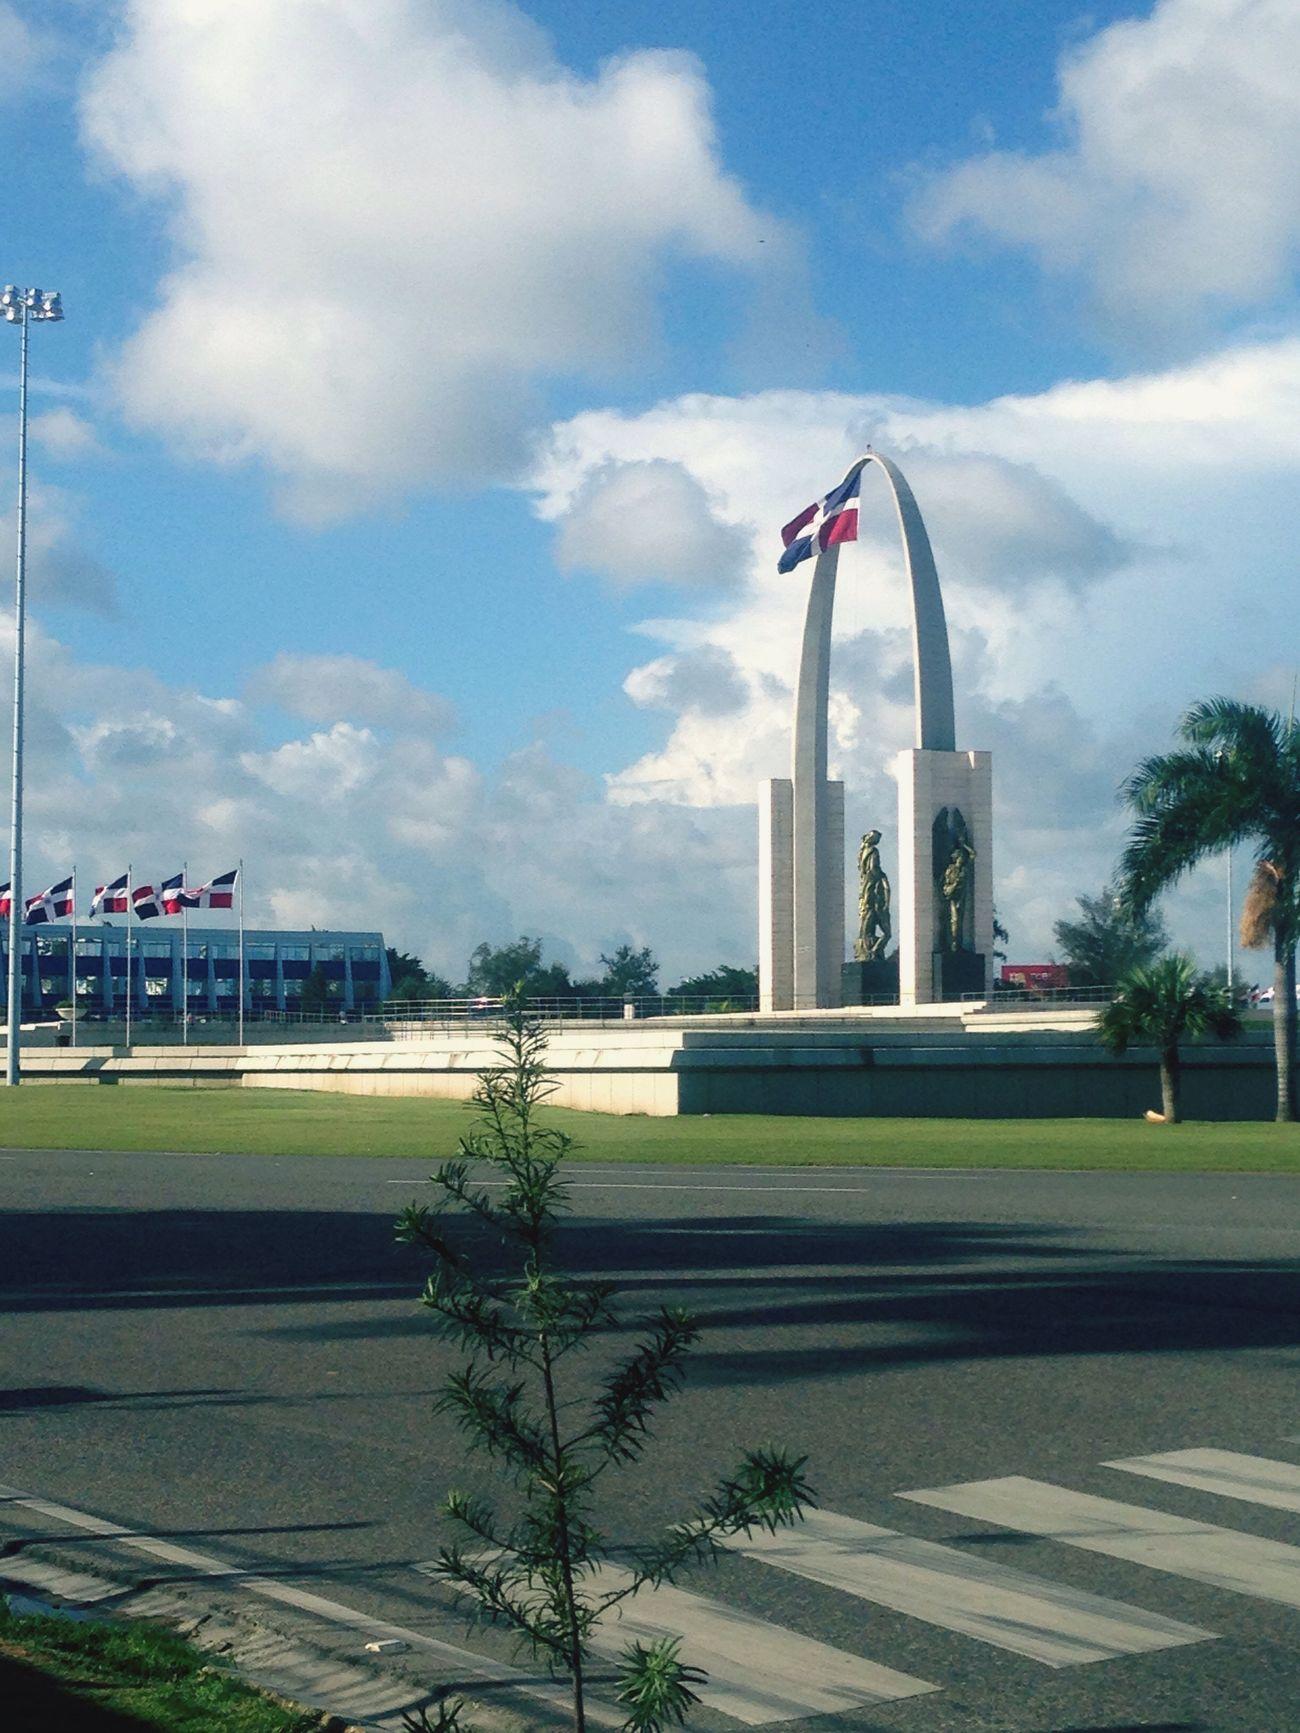 Plaza de la bandera 🇩🇴 Proud Dominican Republica Dominicana Beautiful Flag Blue White And Red PhonePhotography Walking Around